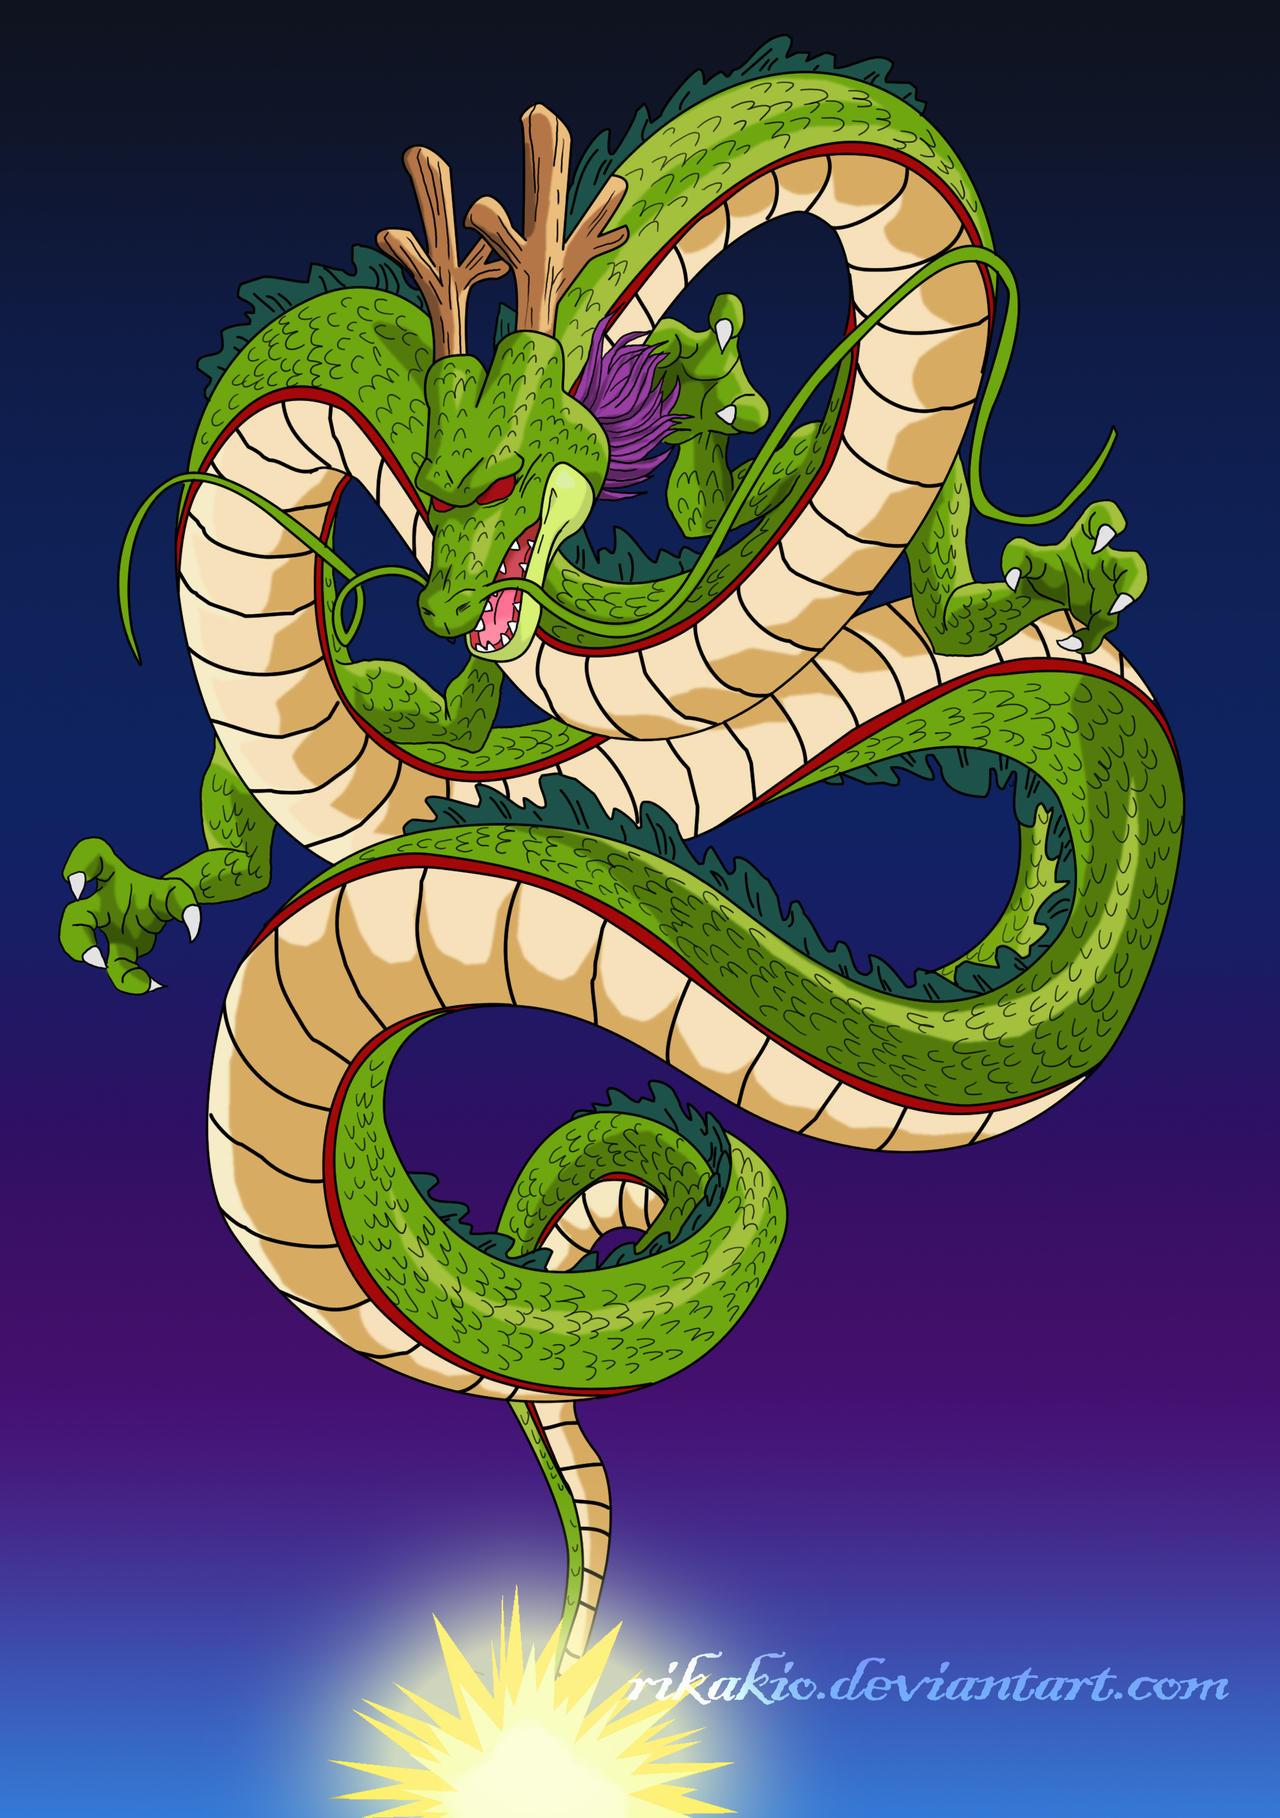 Mi post de shen long imagenes taringa for Dragon ball z decorations